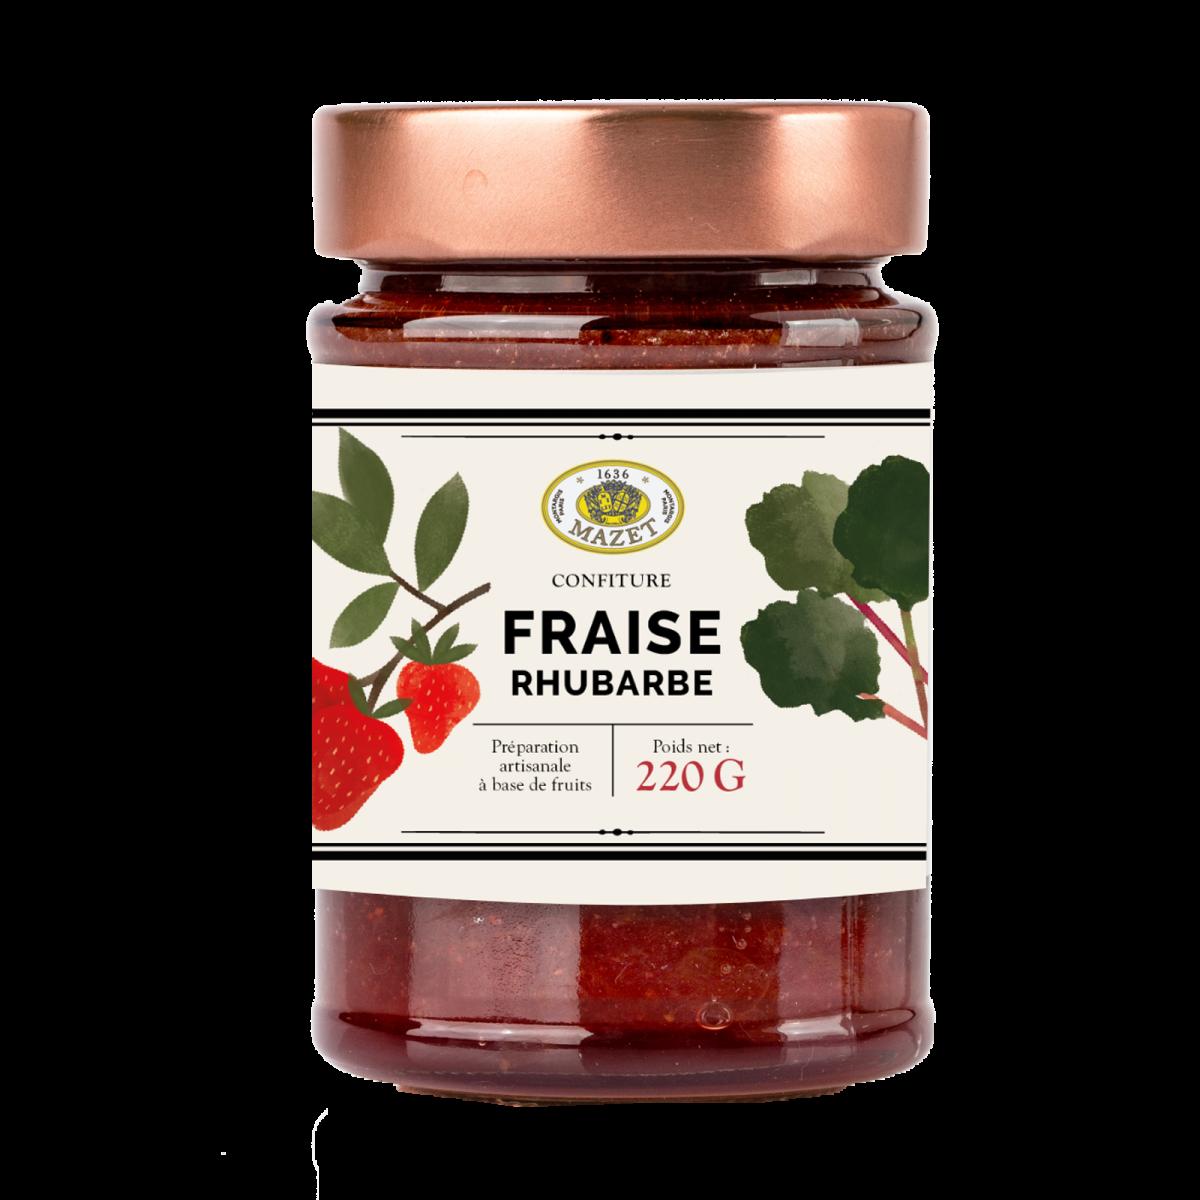 Confitures - Confiture fraise rhubarbe 220g